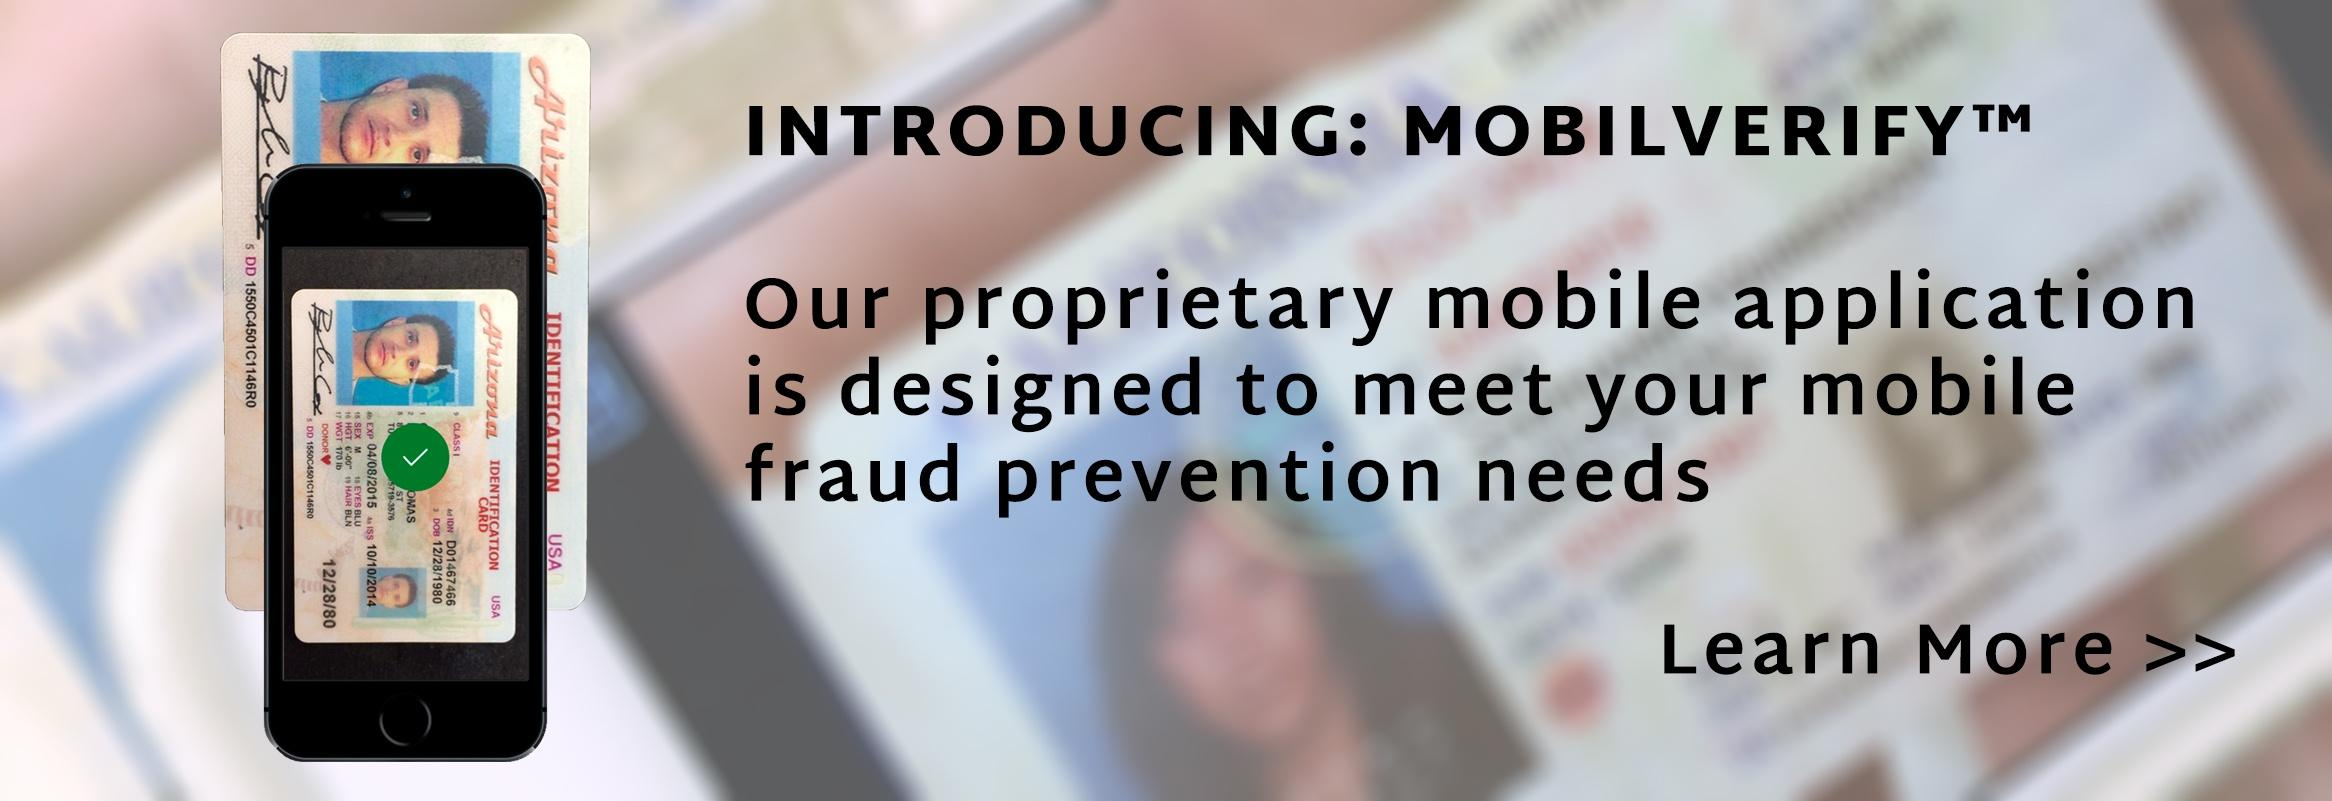 MobilVerify